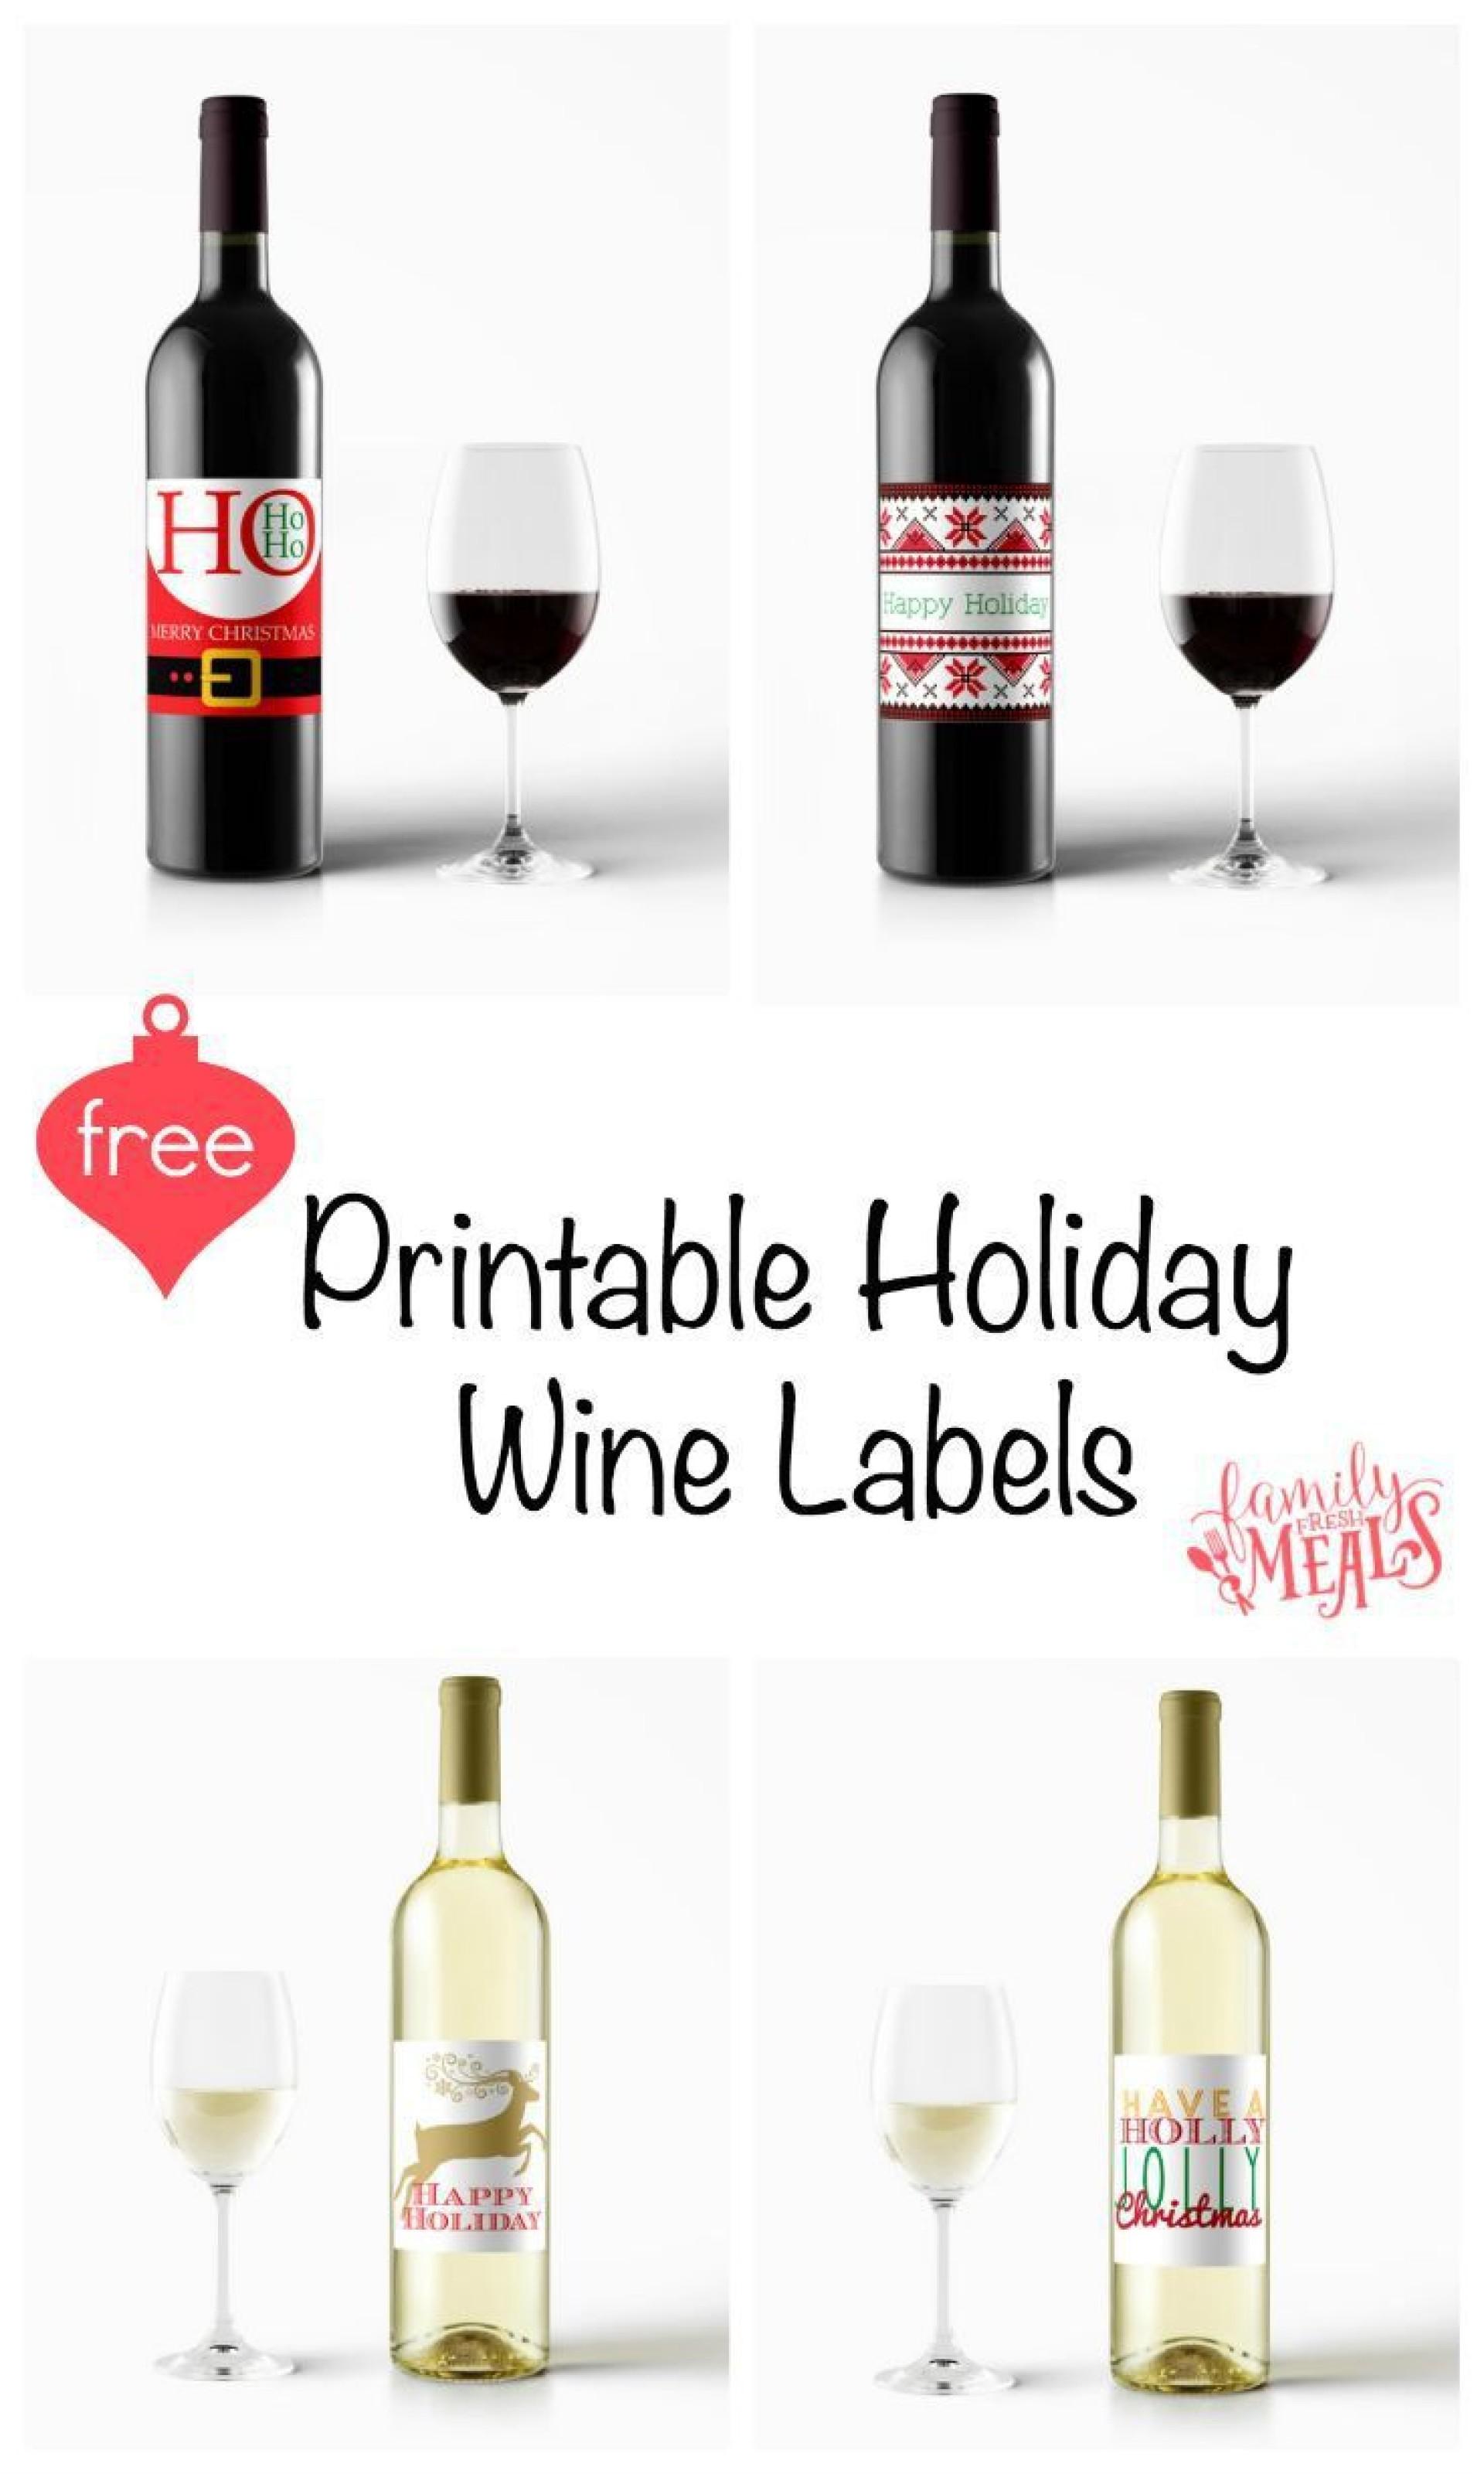 004 Incredible Free Wine Bottle Label Template Sample  Mini Printable1920